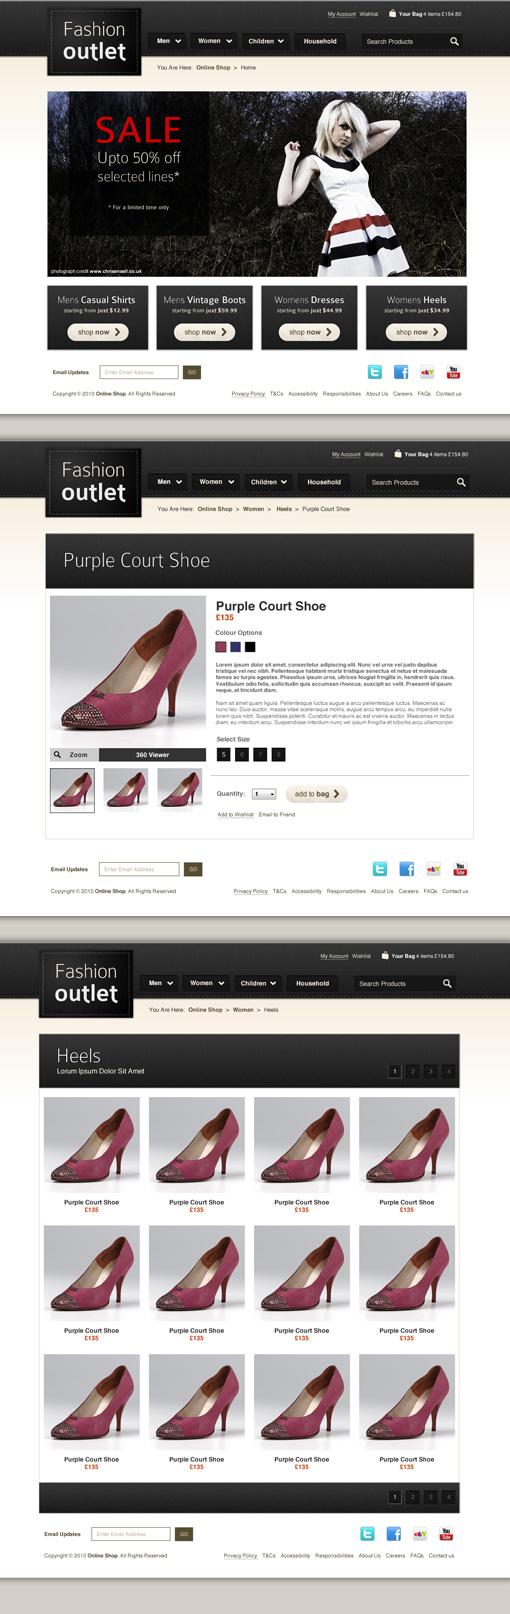 Luxury eCommerce Website Template